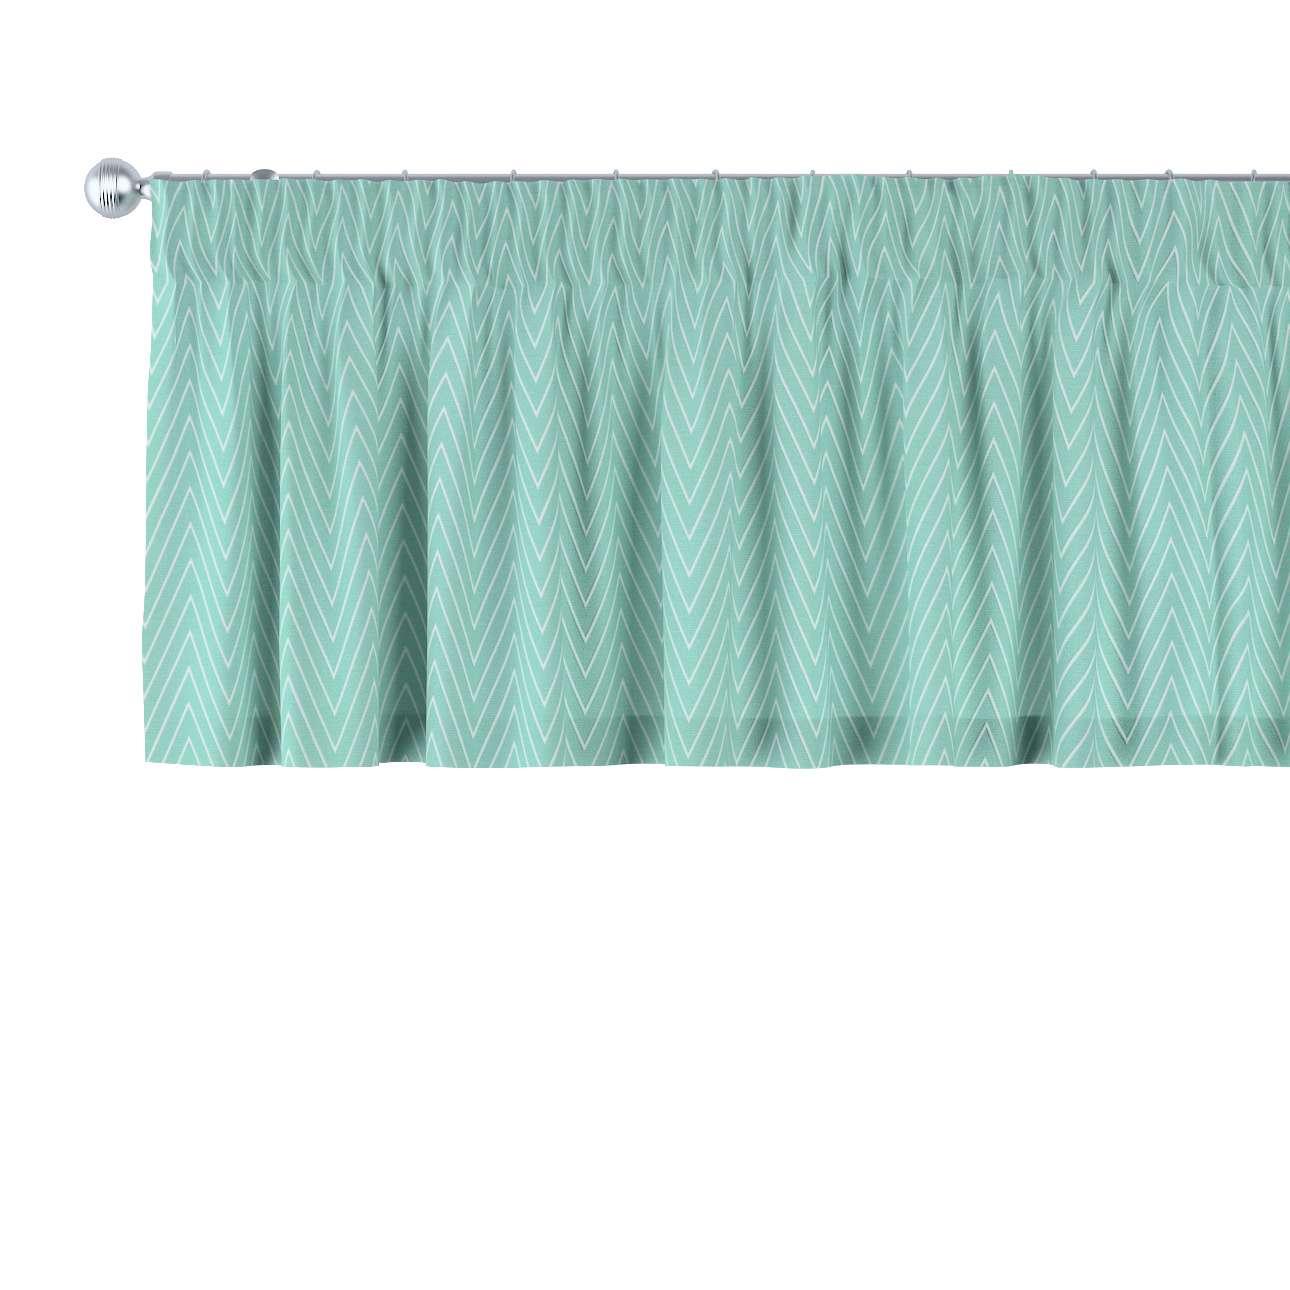 Gardinkappe med rynkebånd 130 x 40 cm fra kollektionen Brooklyn, Stof: 137-90